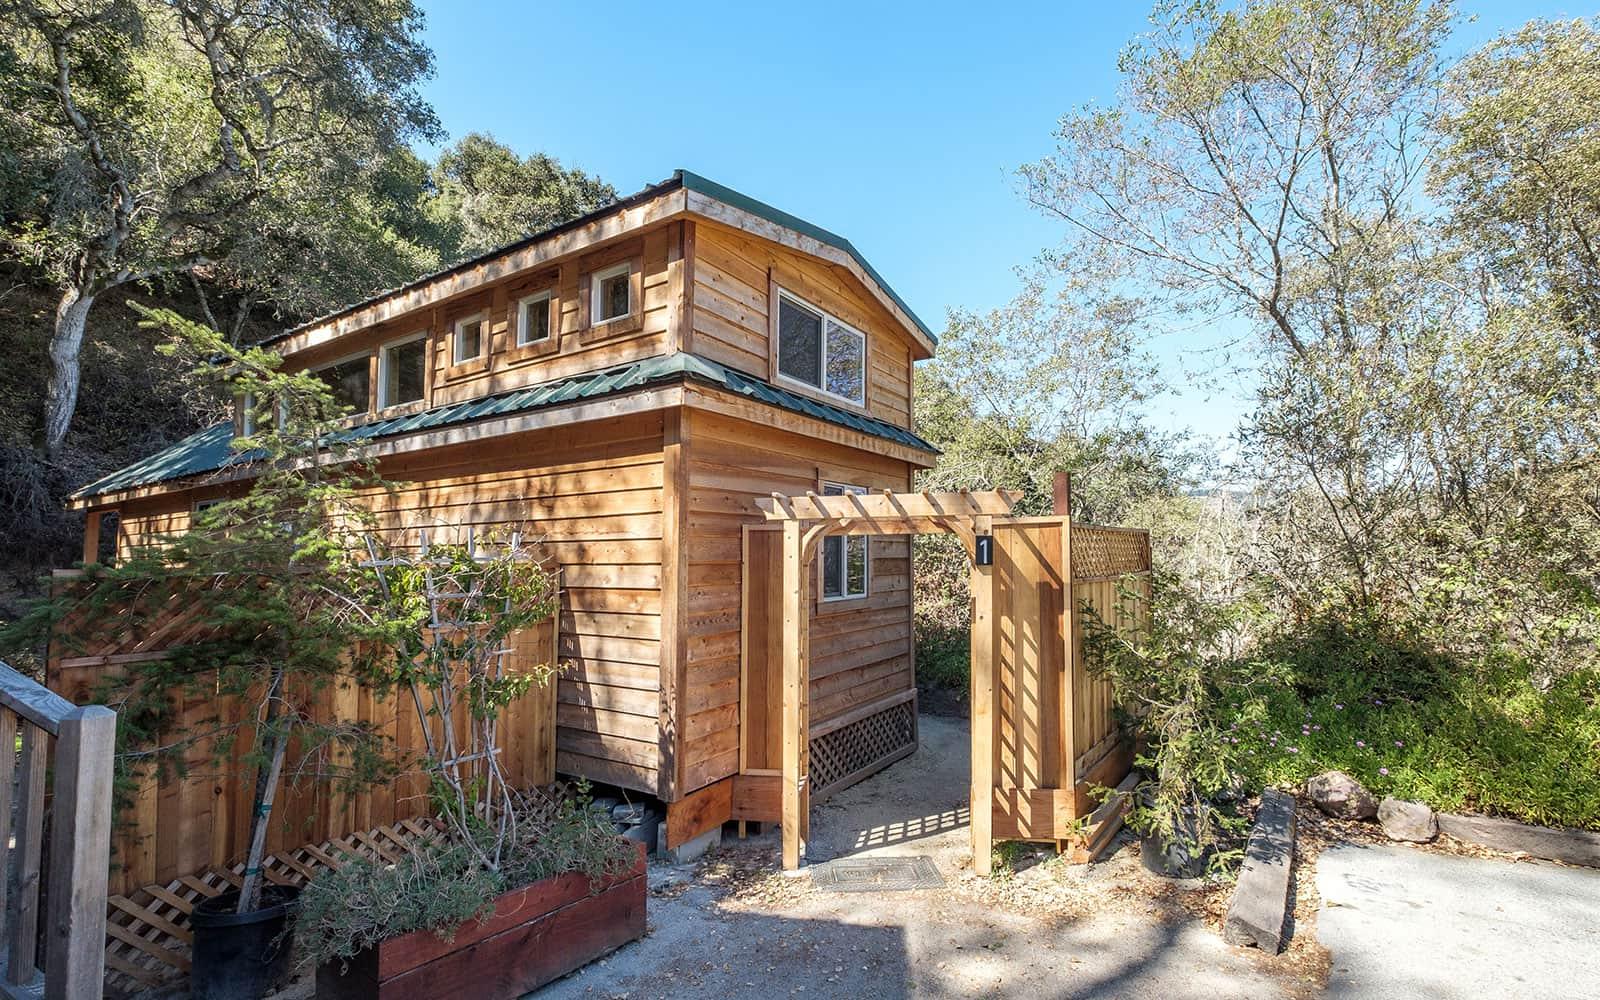 Cabin 1, exterior